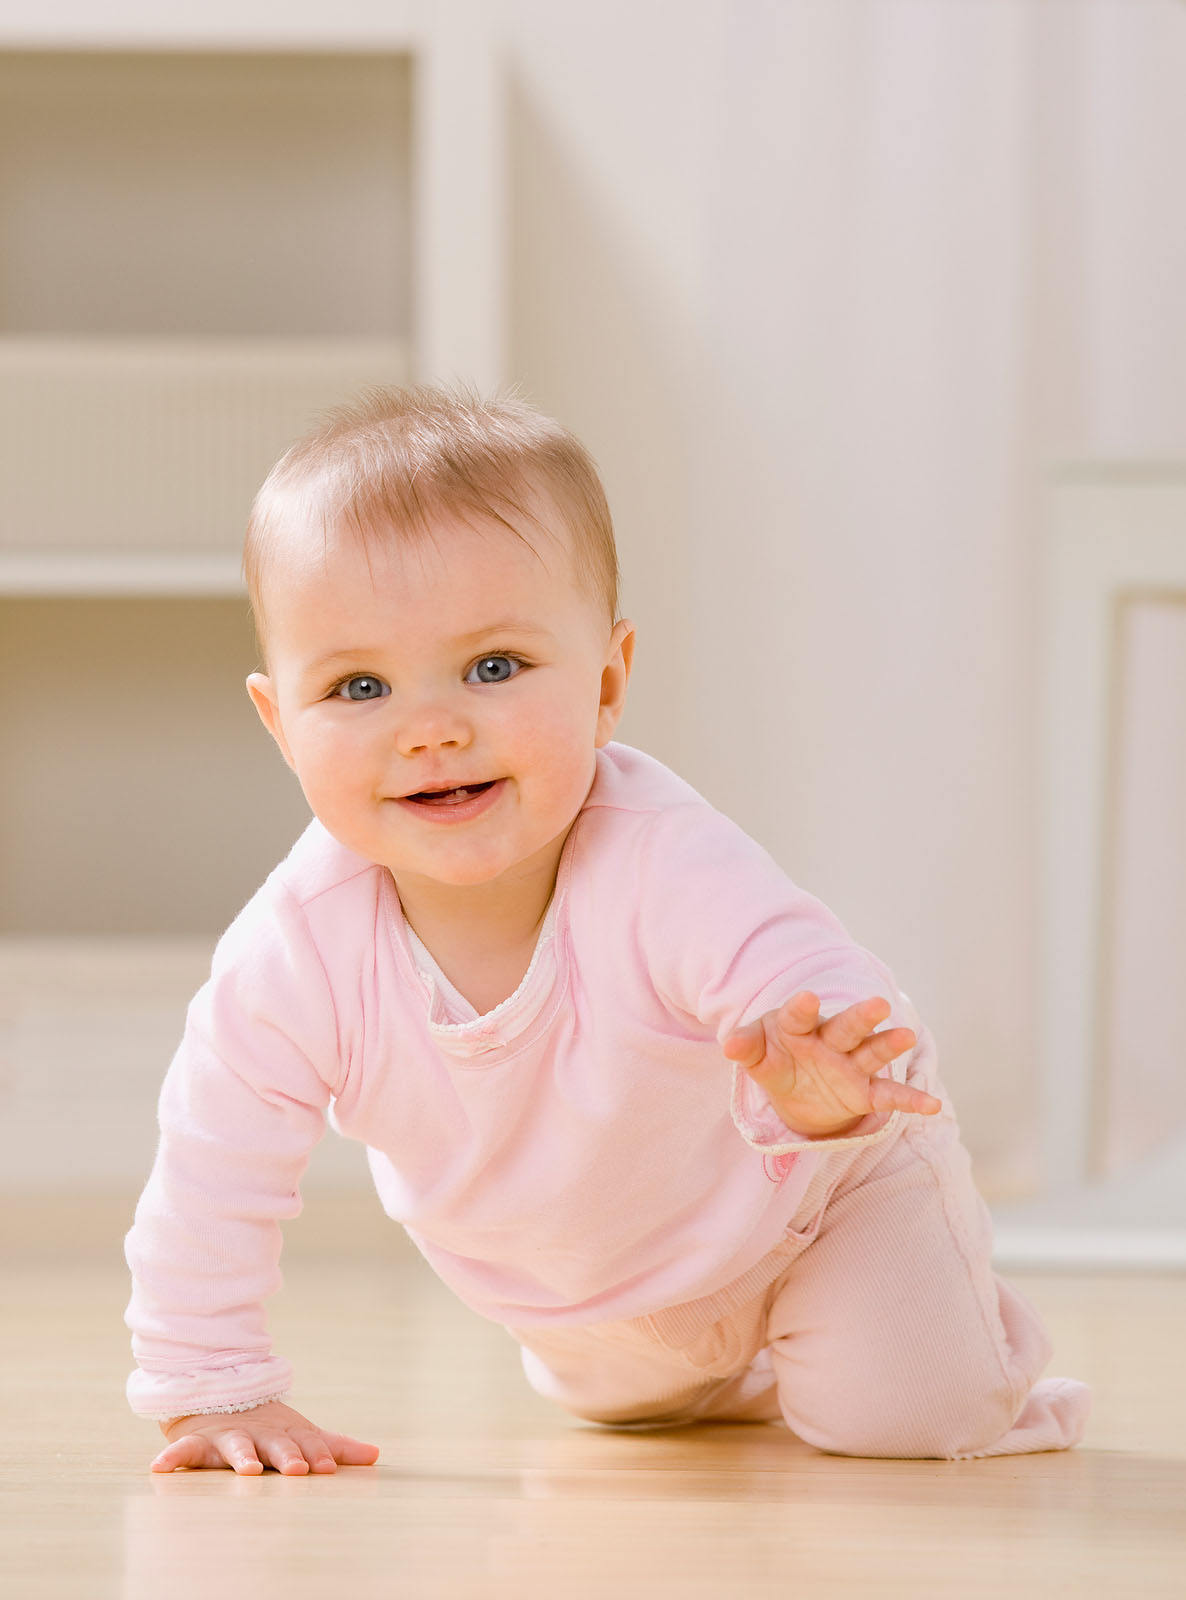 Красная щека у ребенка фото